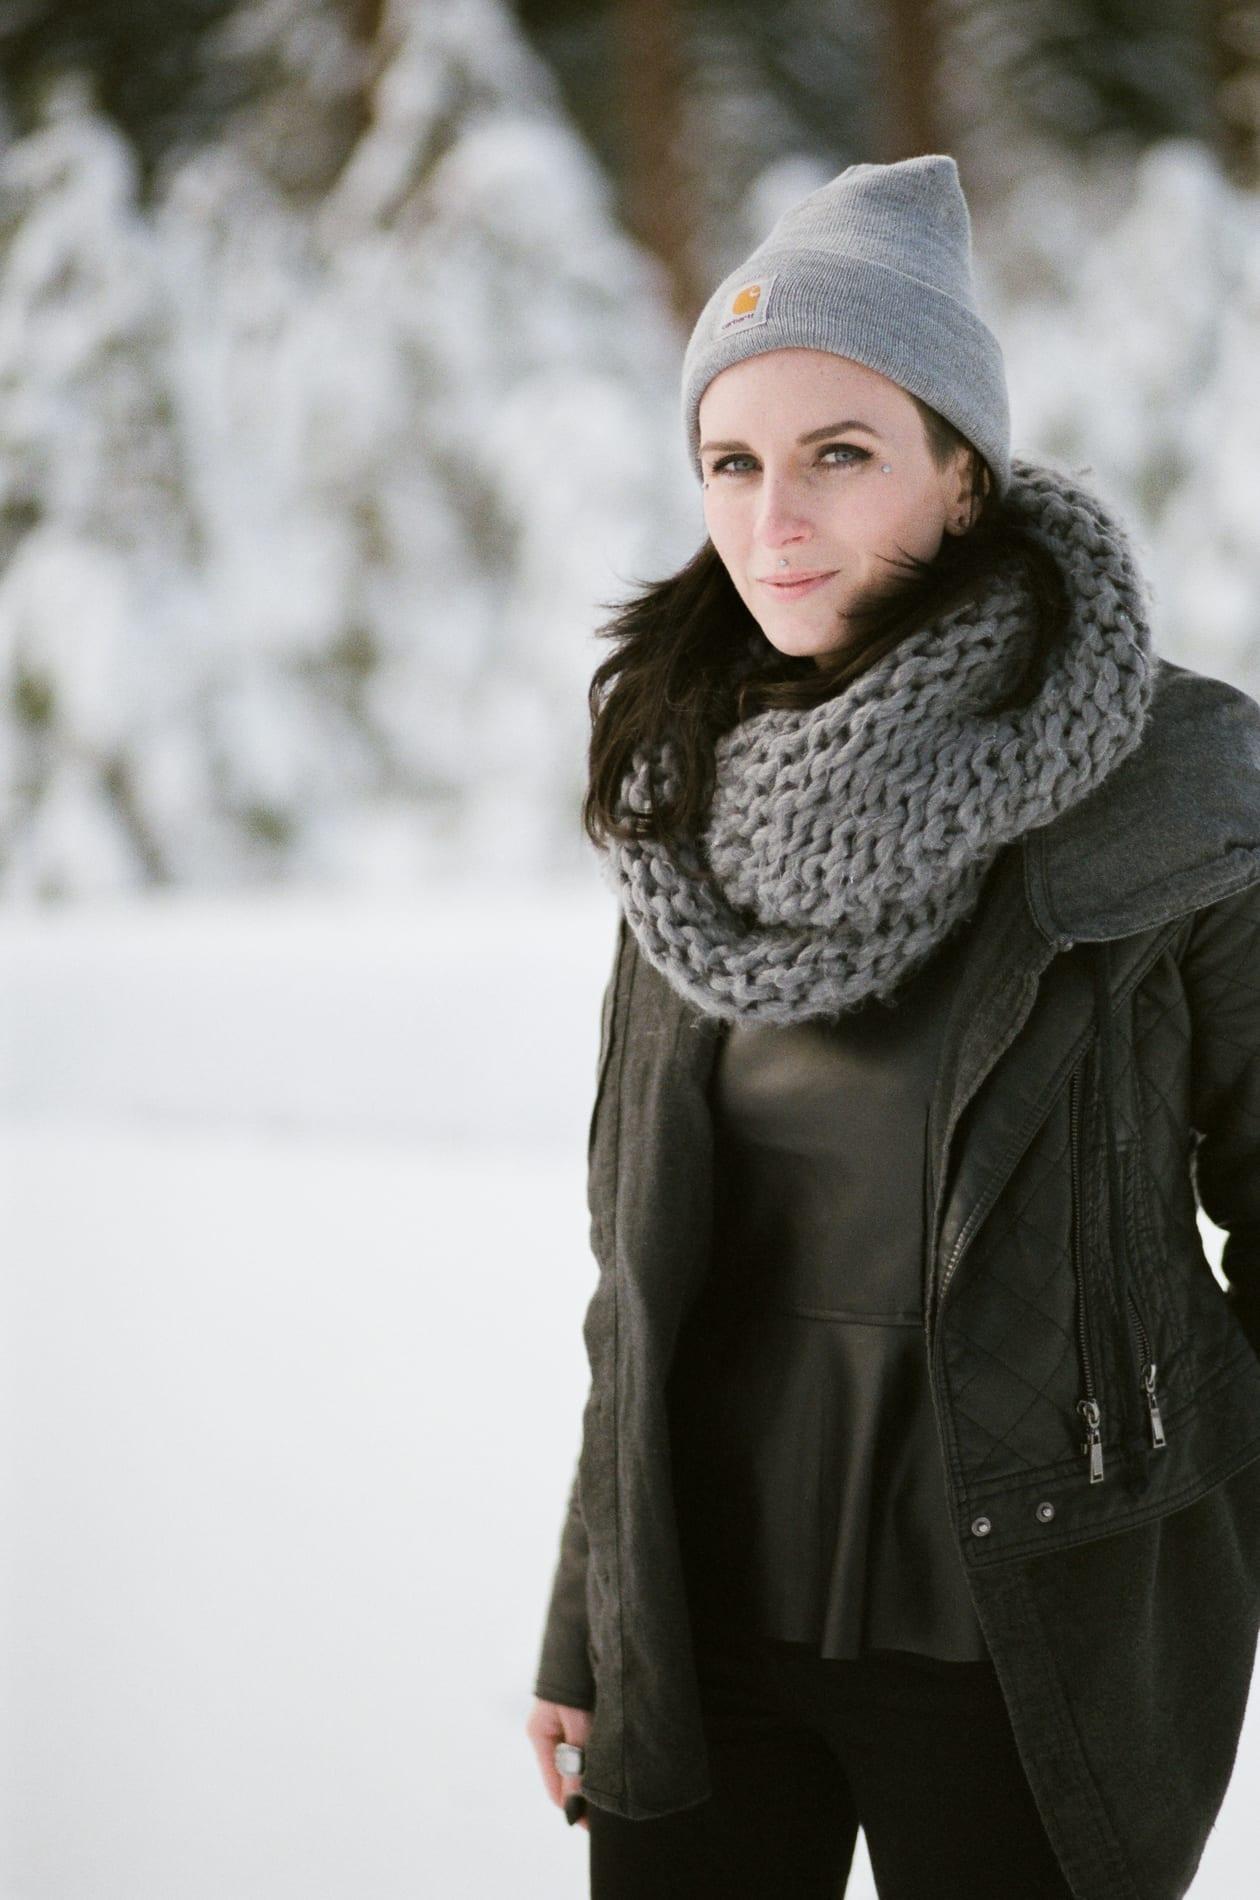 mt-lassen-winter-snow-couples-photo-14